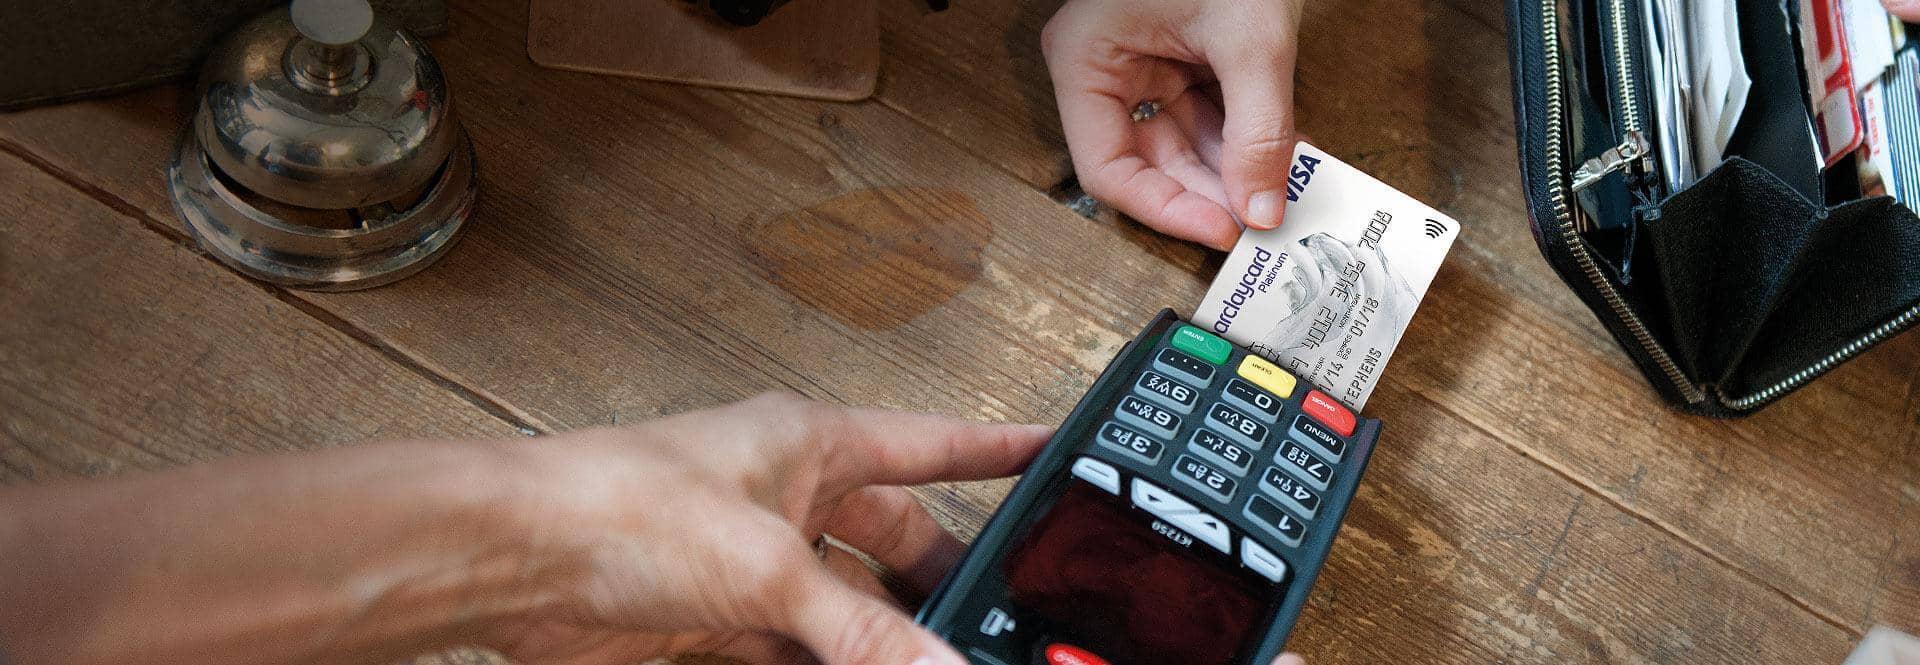 Desktop Card Machines| Countertop Payments| Barclaycard Business